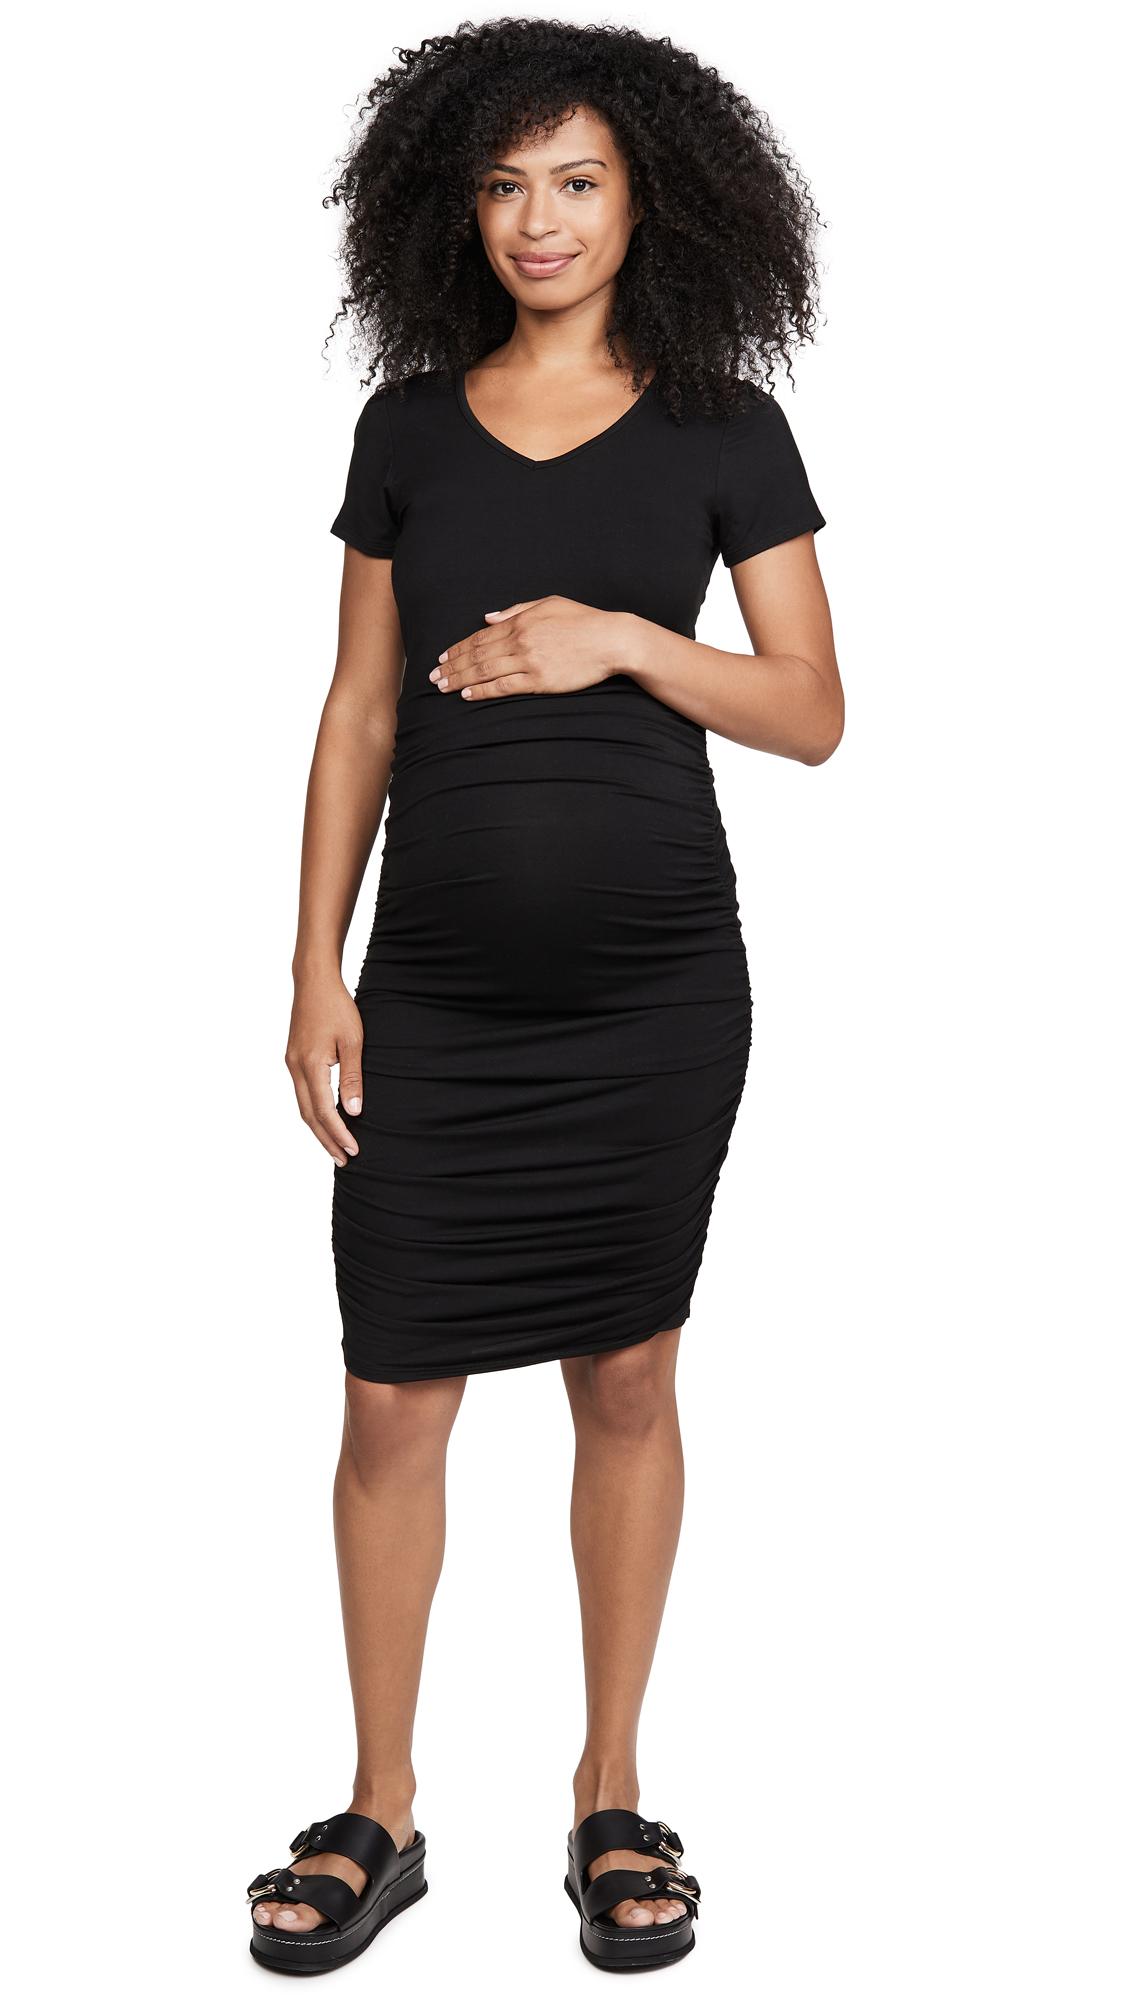 Buy David Lerner Maternity Tee Dress online beautiful David Lerner Clothing, Dresses